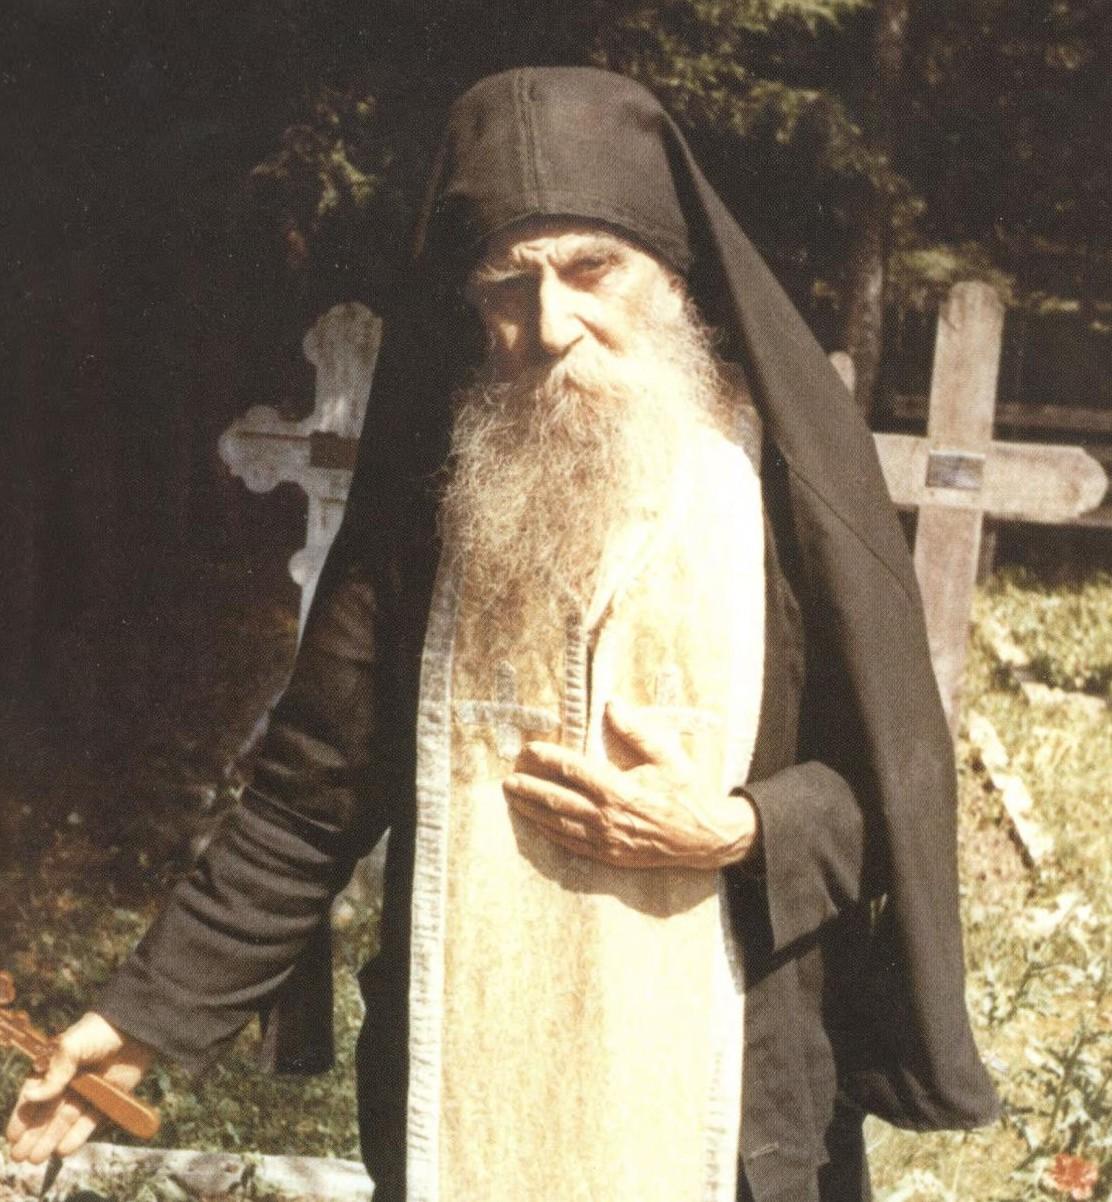 PARINTELE PAISIE OLARU – Testamentul dragostei duhovnicesti (video, audio)